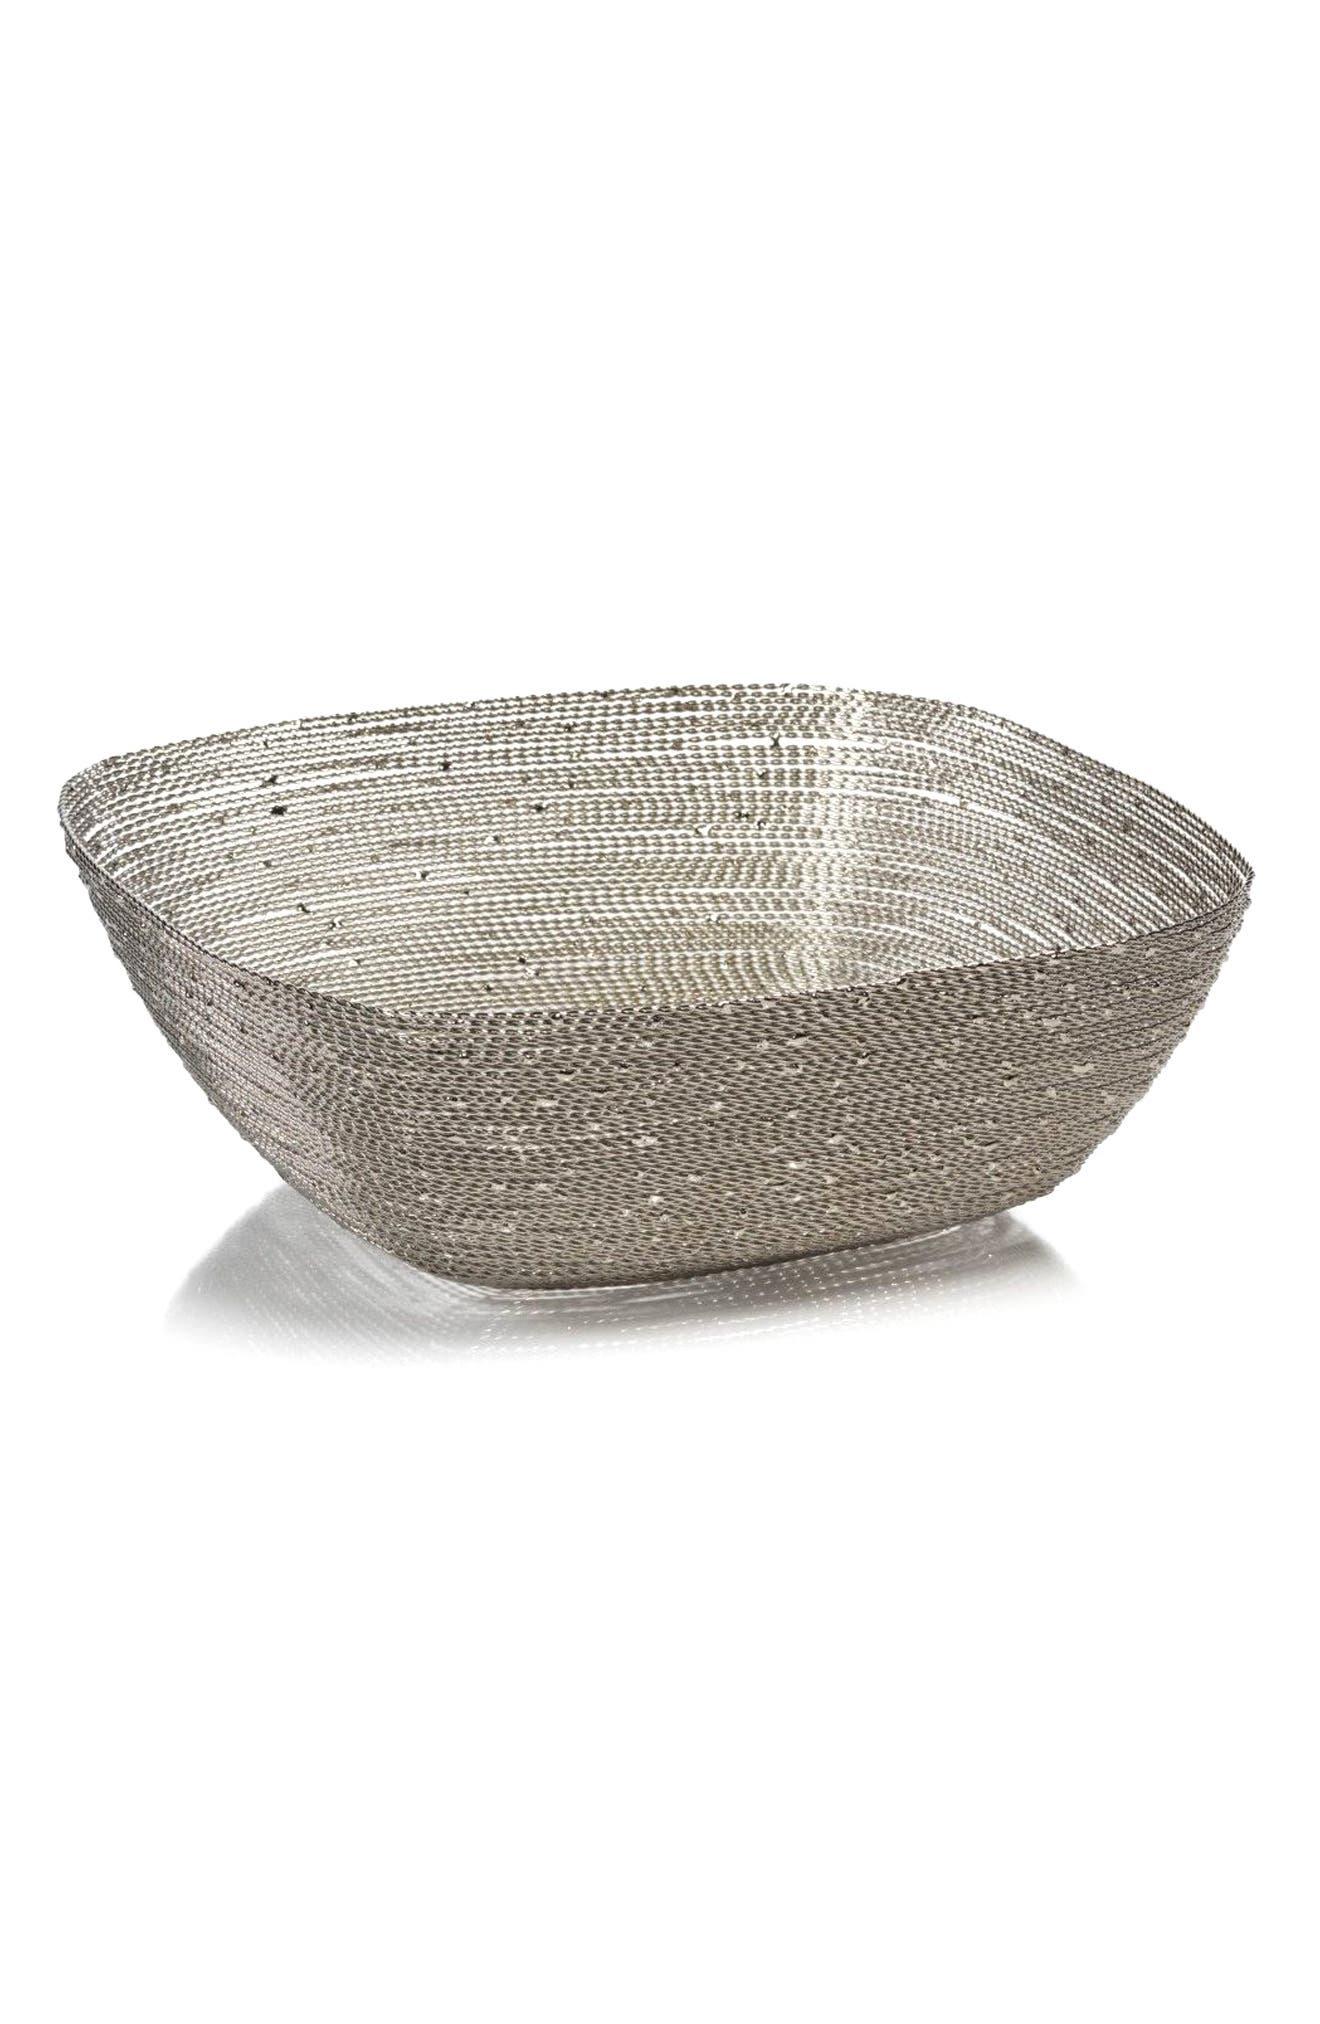 Main Image - Zodax Zulu Large Square Woven Wire Basket